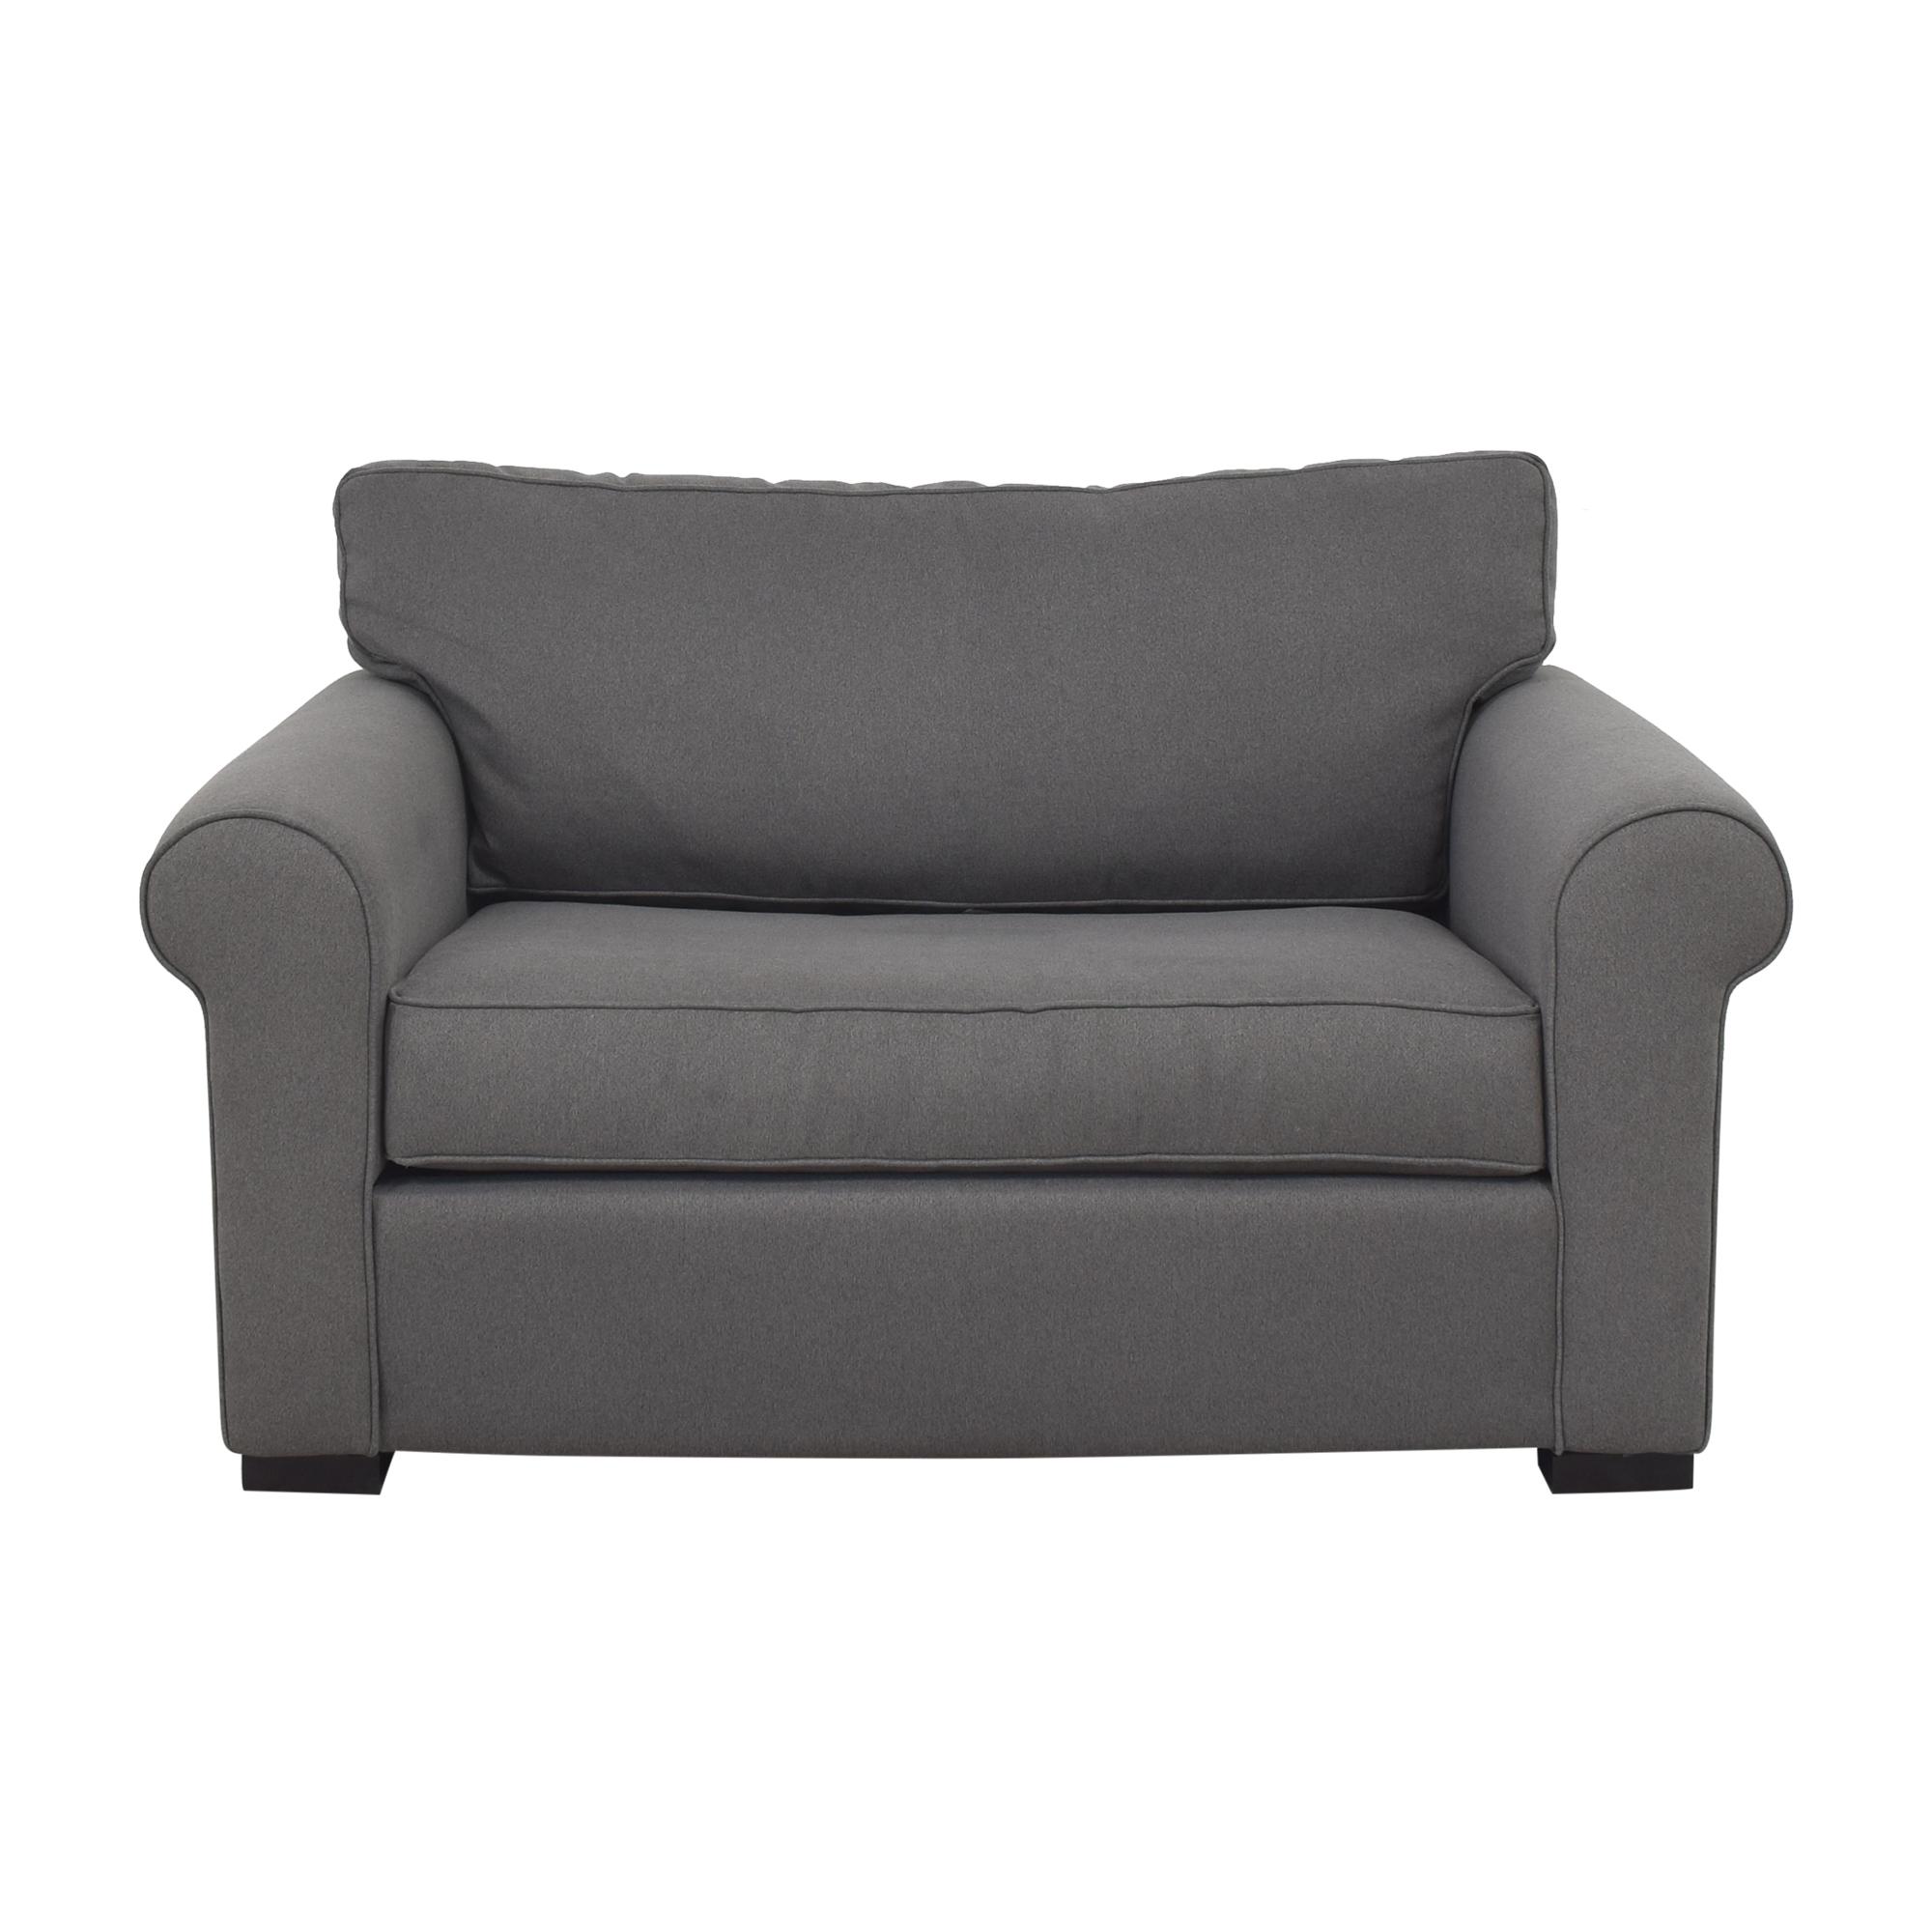 buy Macy's Bench Cushion Twin Sleeper Sofa Macy's Sofa Beds